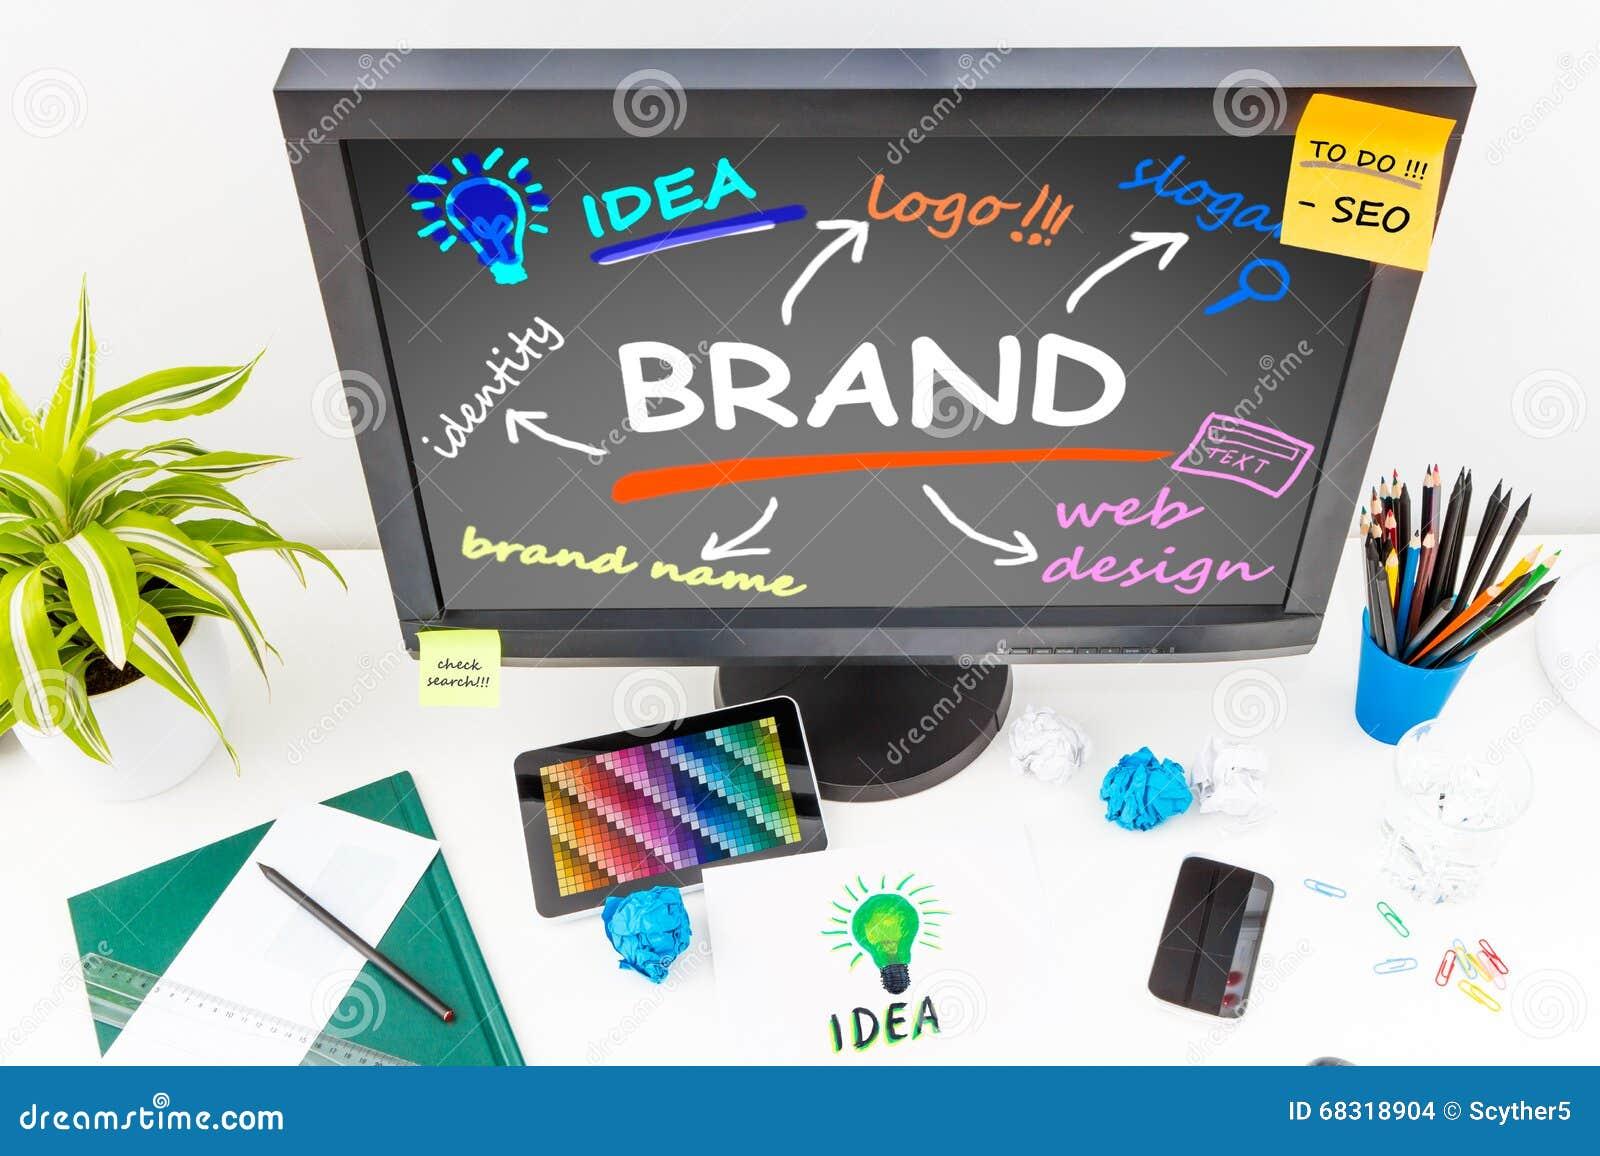 Brand Branding Design Marketing Drawing